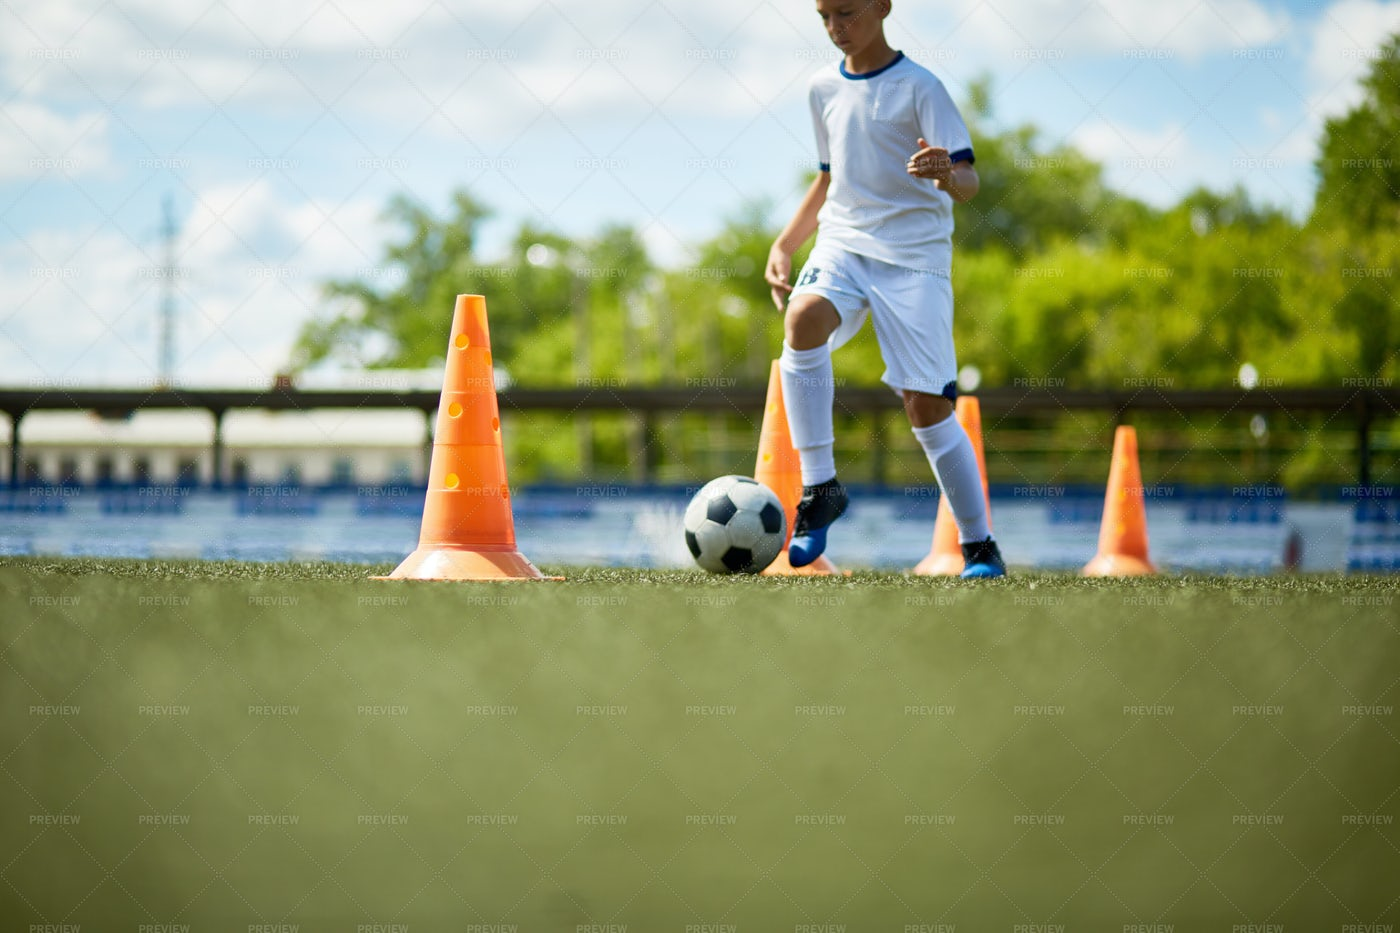 Boy Training In Football Field: Stock Photos